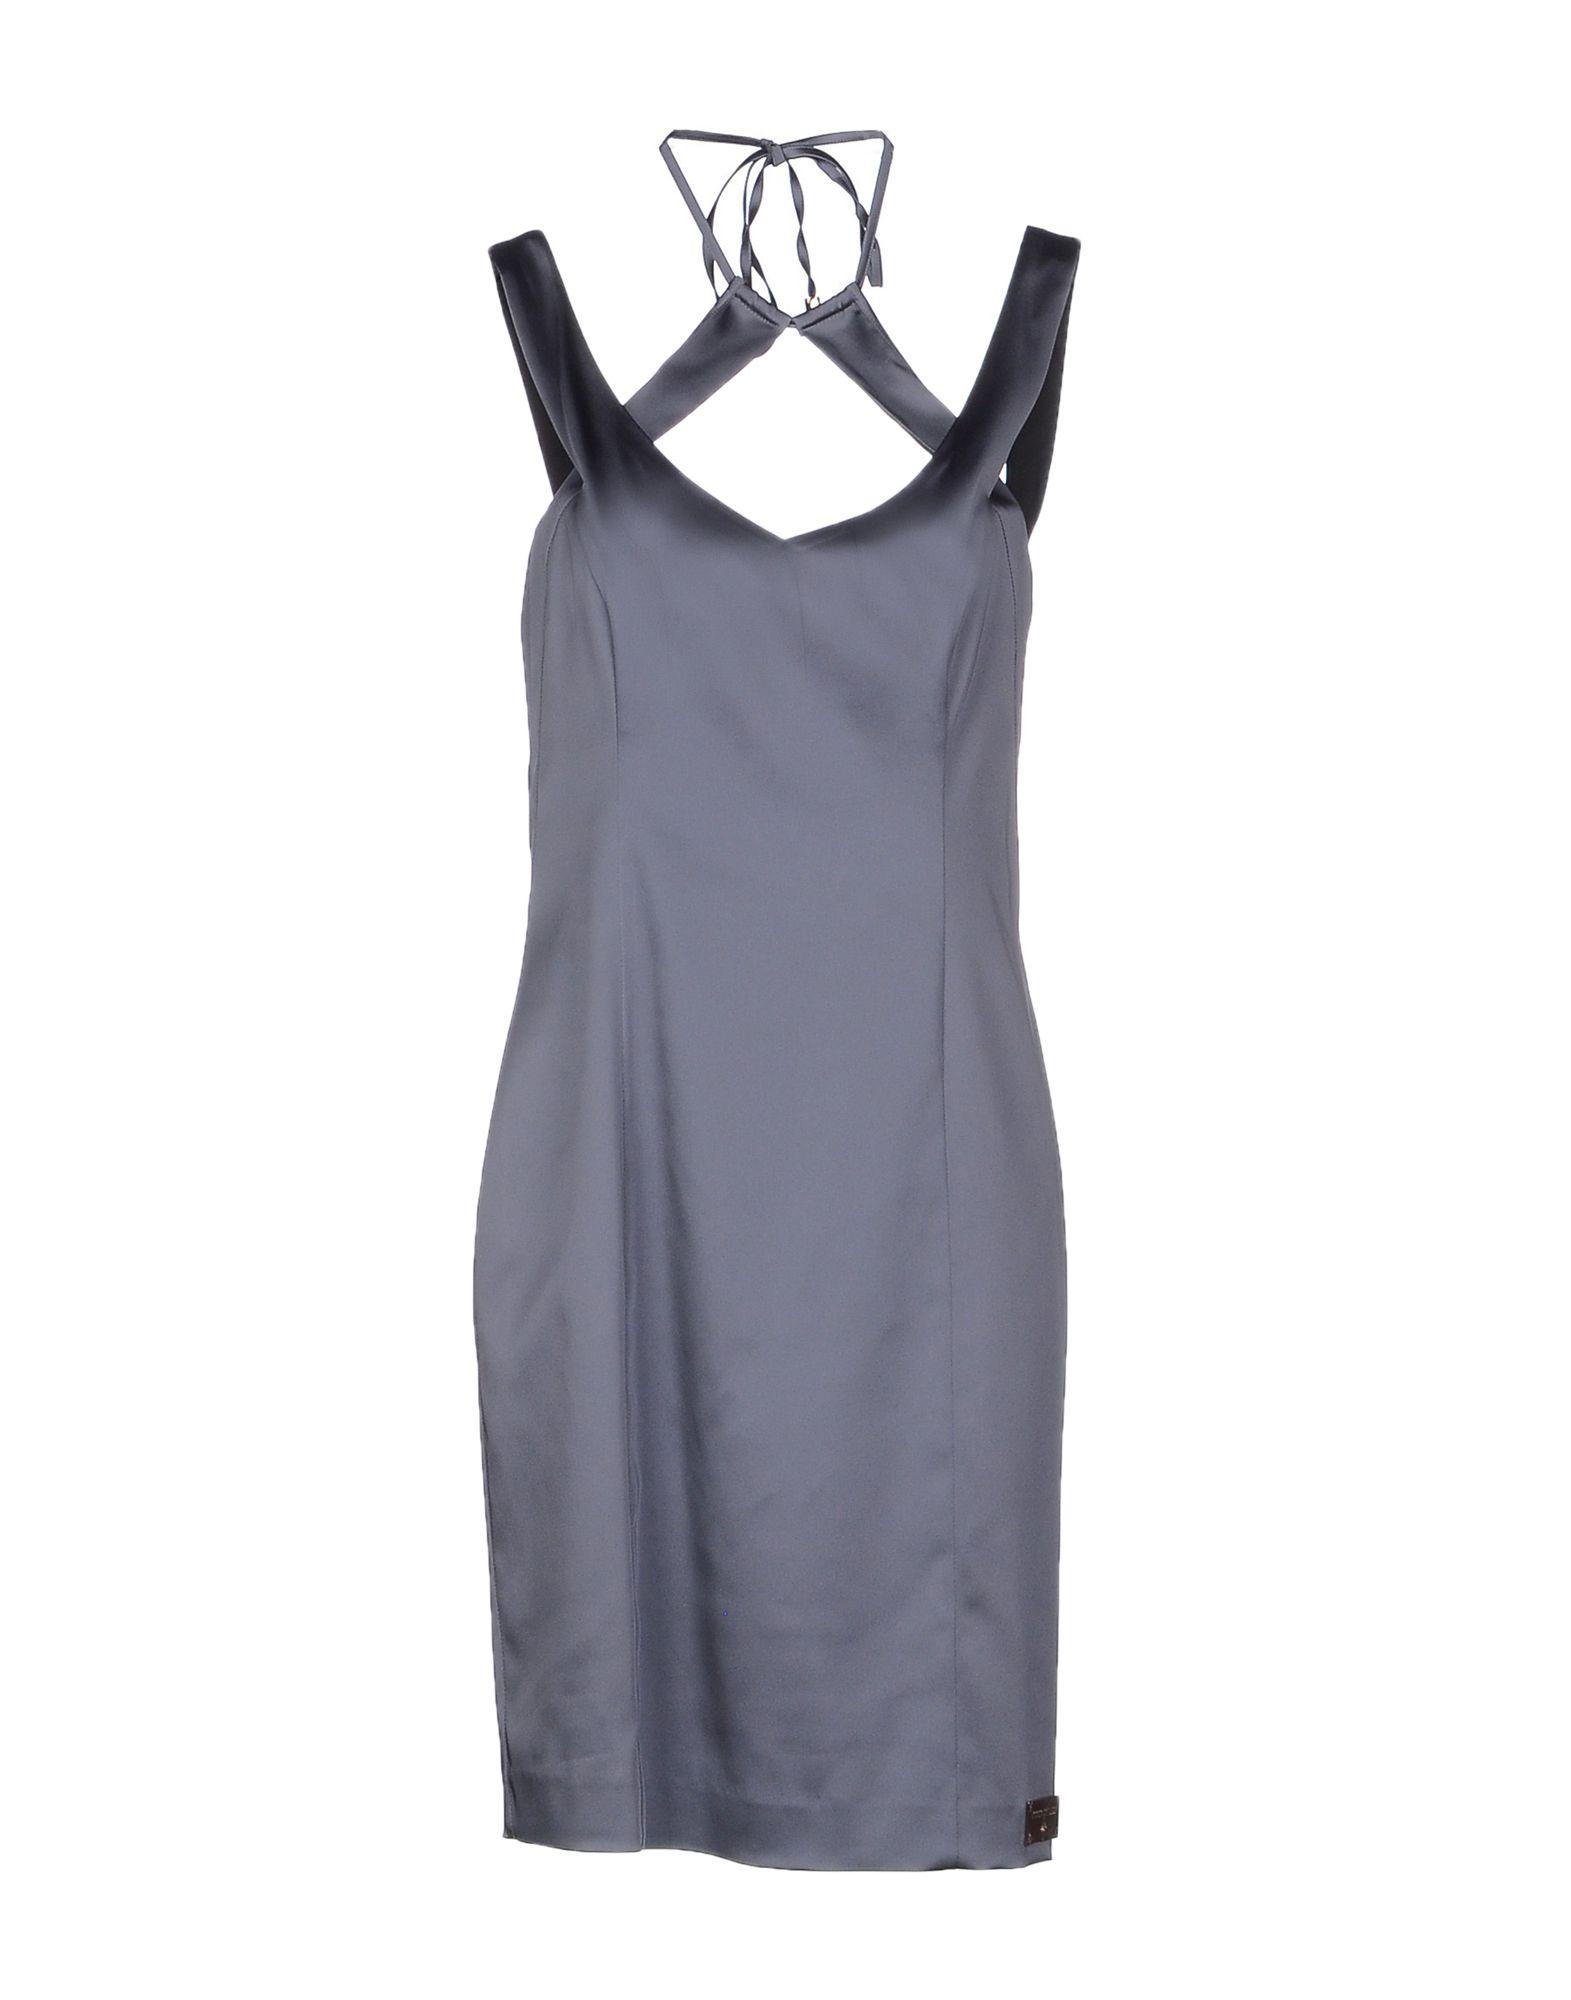 цена  GOOD ON HEELS Короткое платье  онлайн в 2017 году